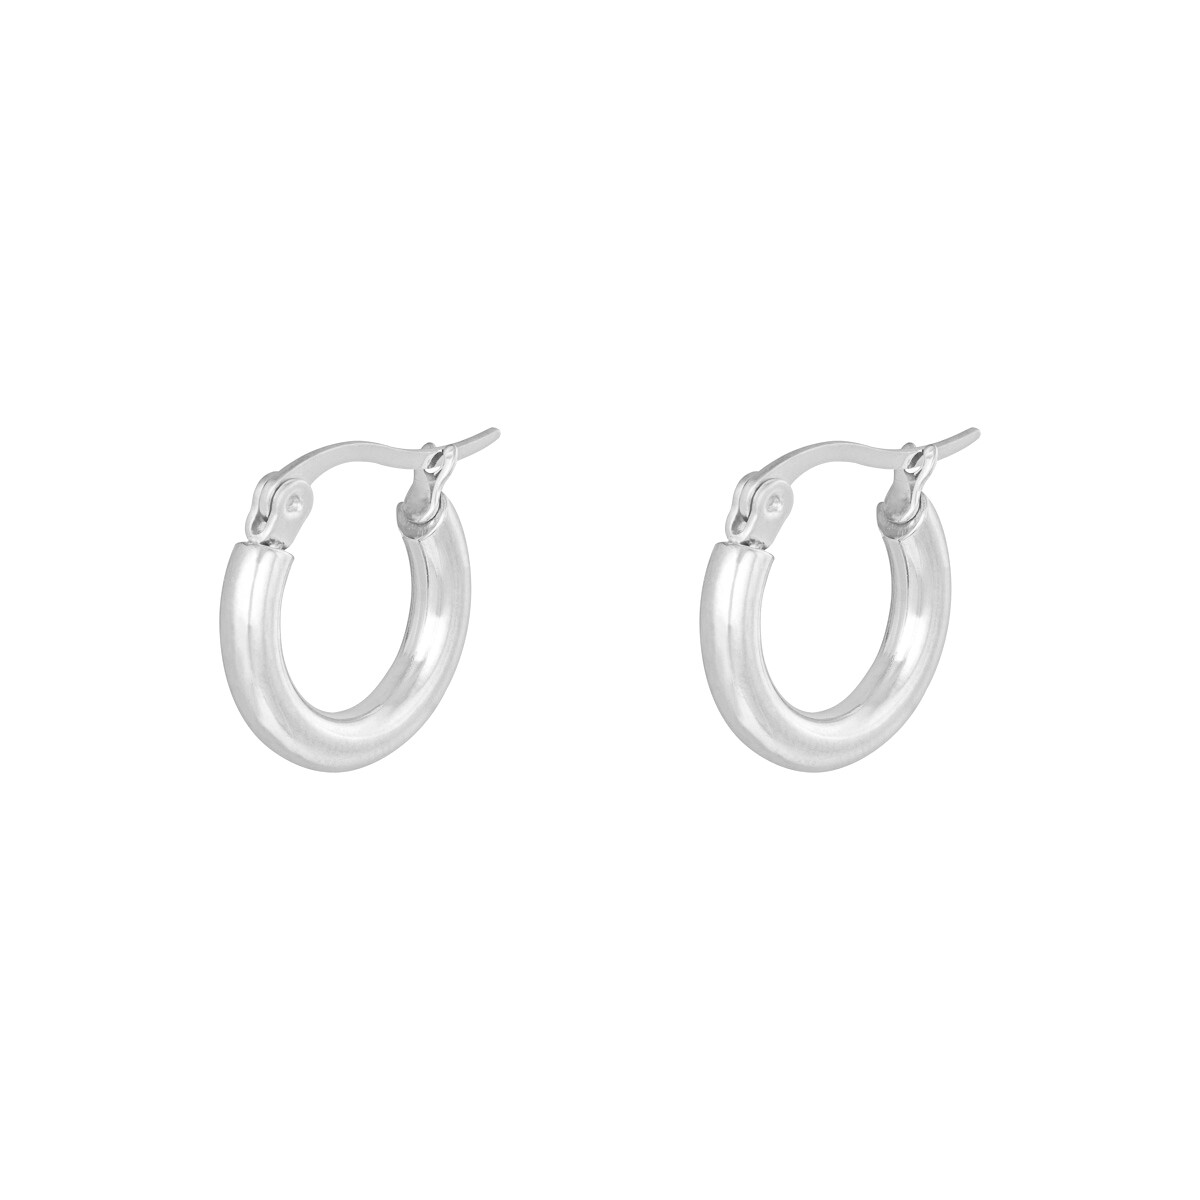 Basic stainless steel oorringetjes zilver 15mm